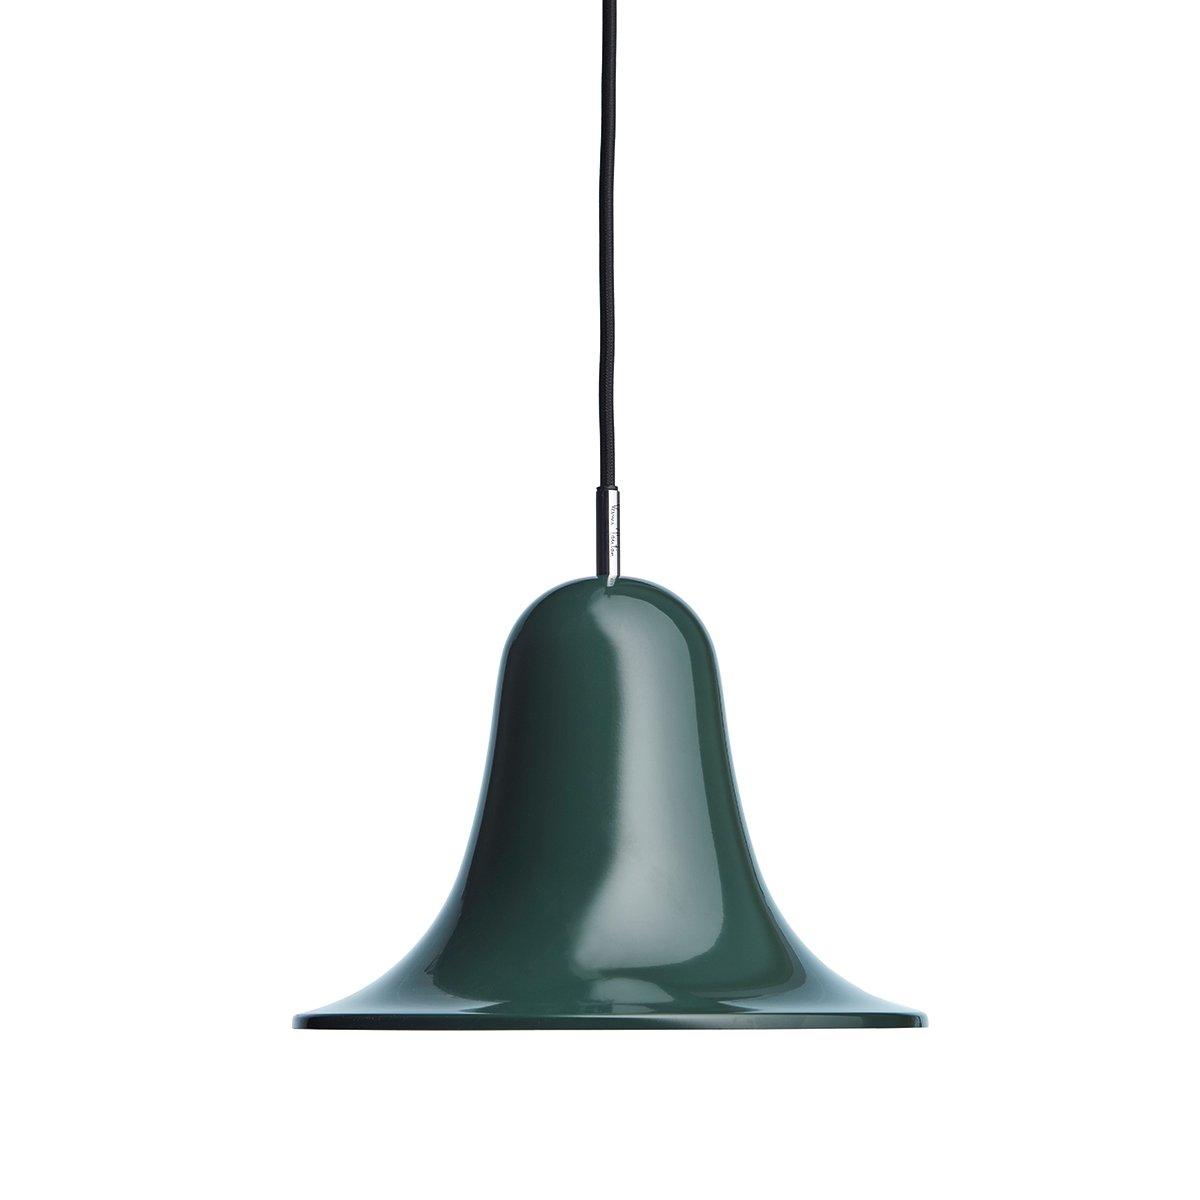 Verpan Pantop Hanglamp - Donkergroen / Ø23 x h. 16,6 cm.